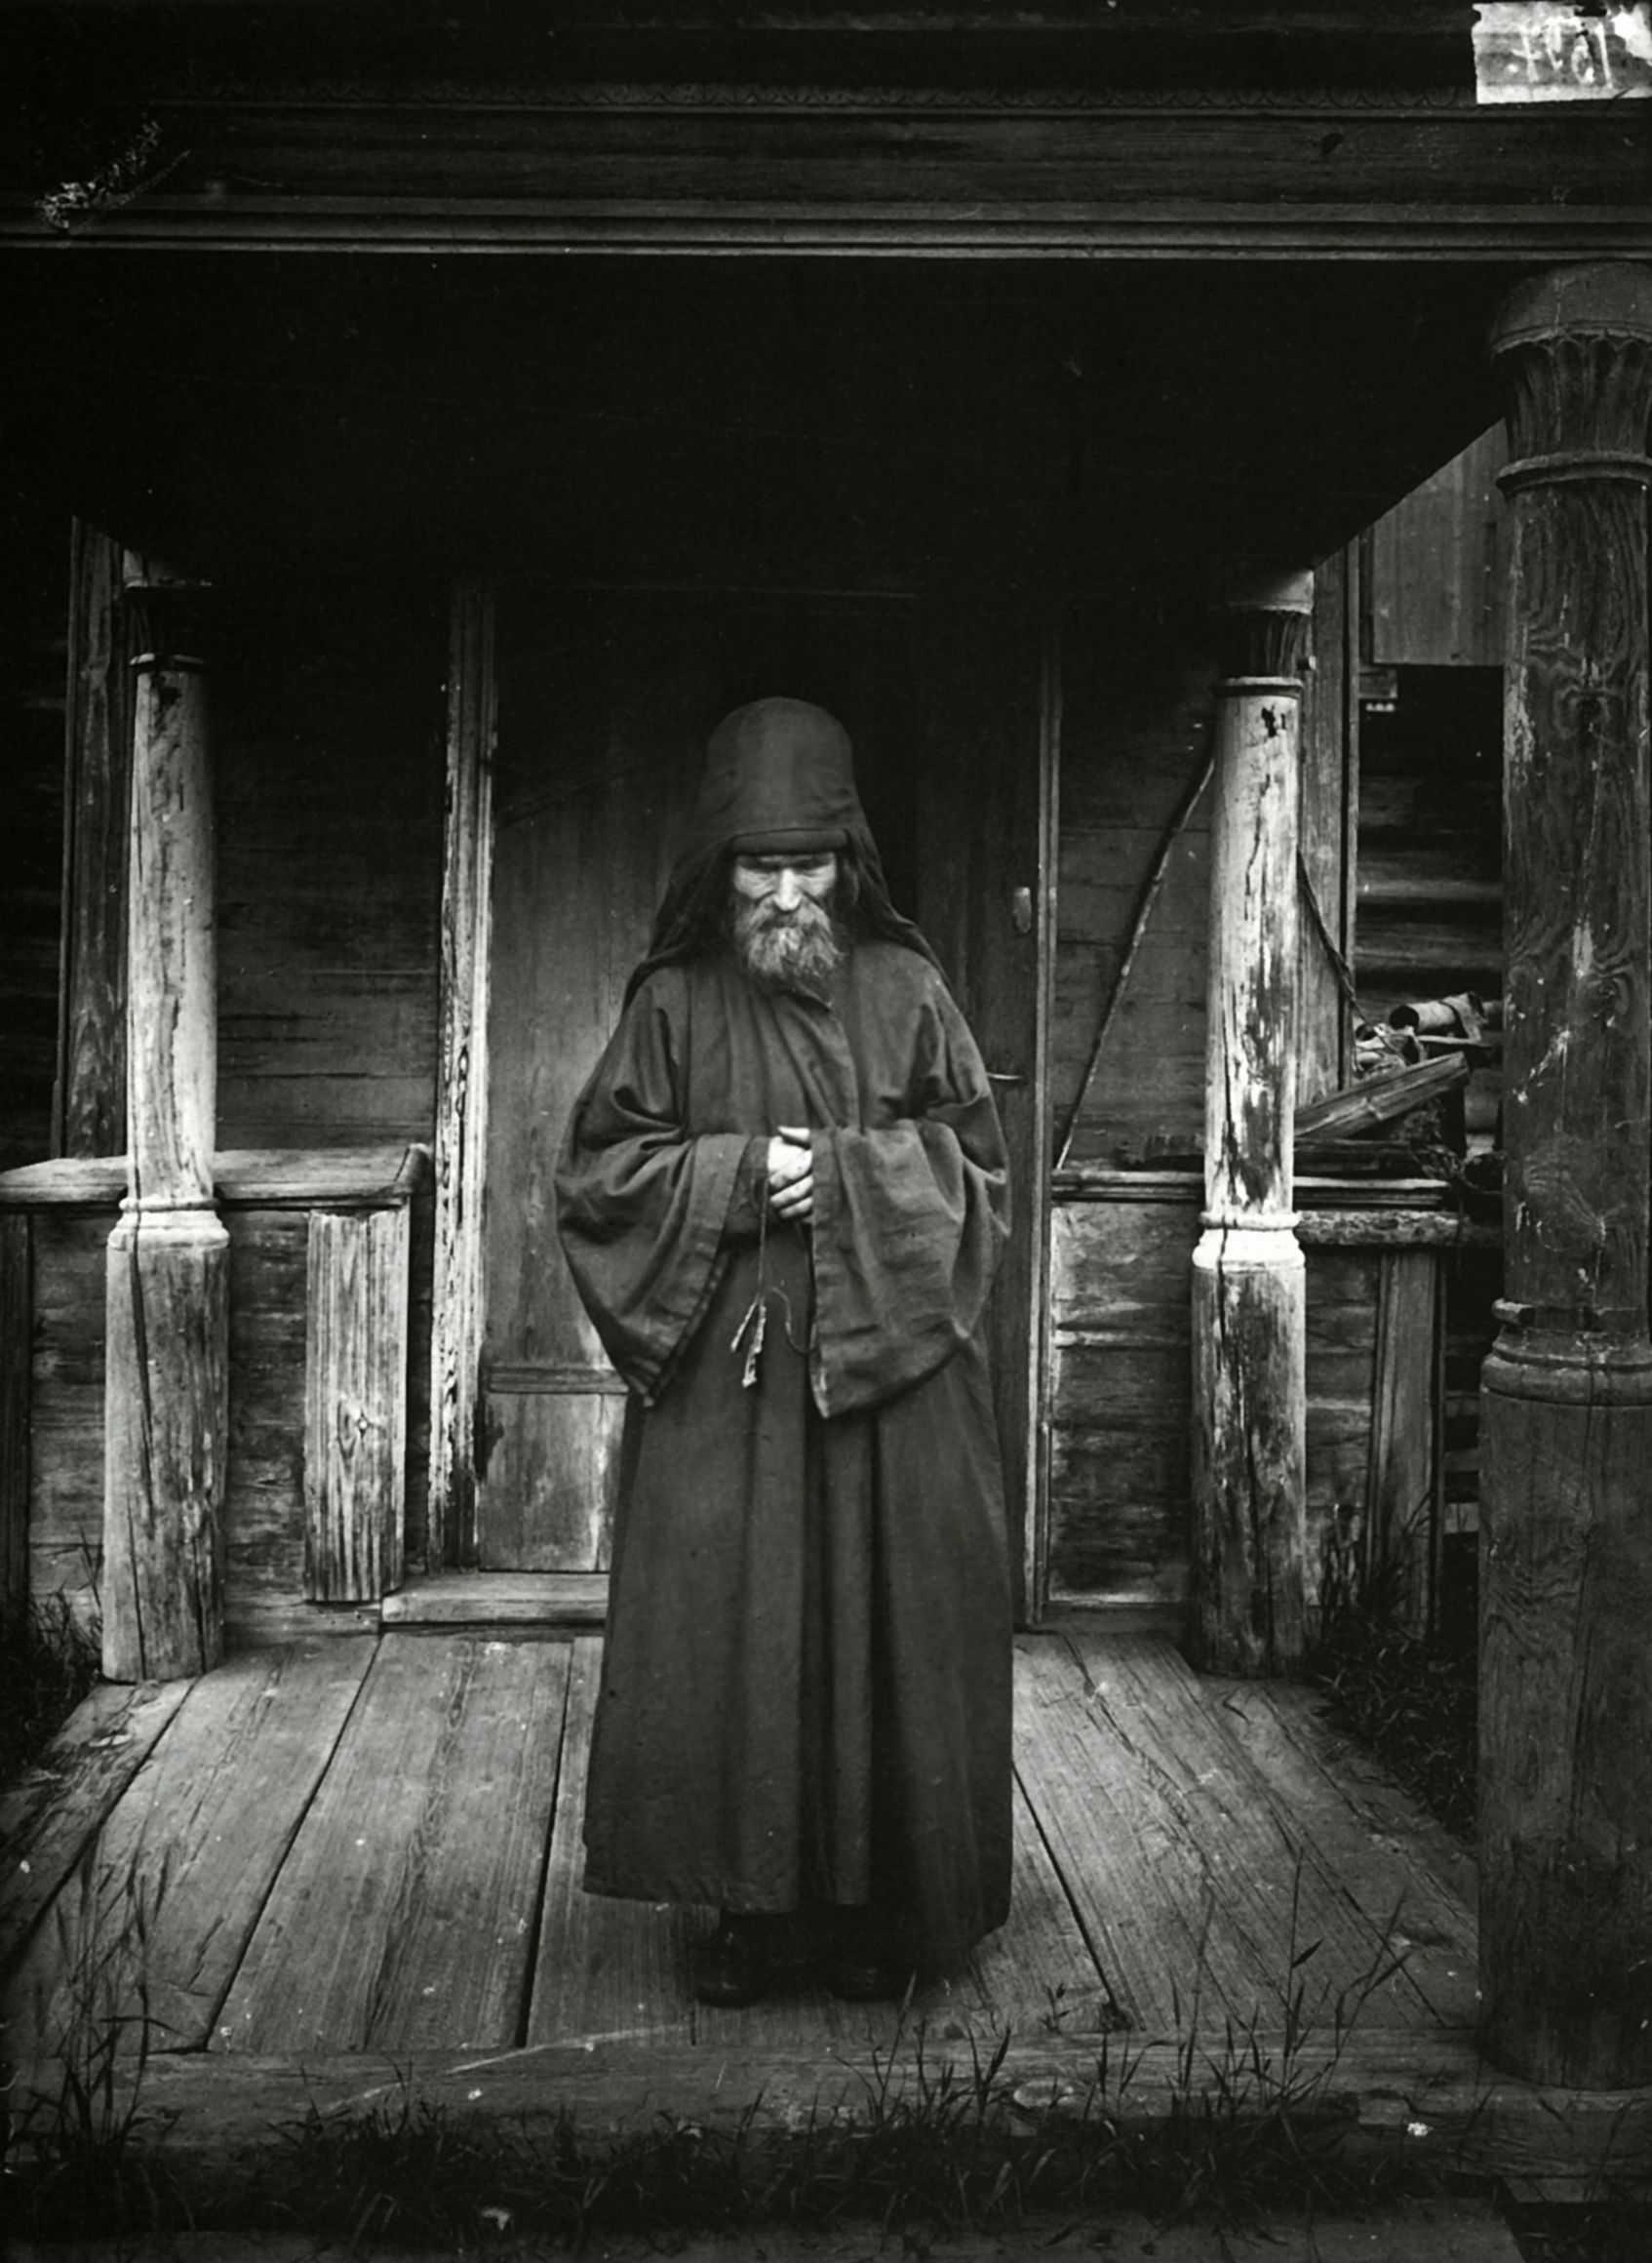 Черно белые фото монахини 7 фотография